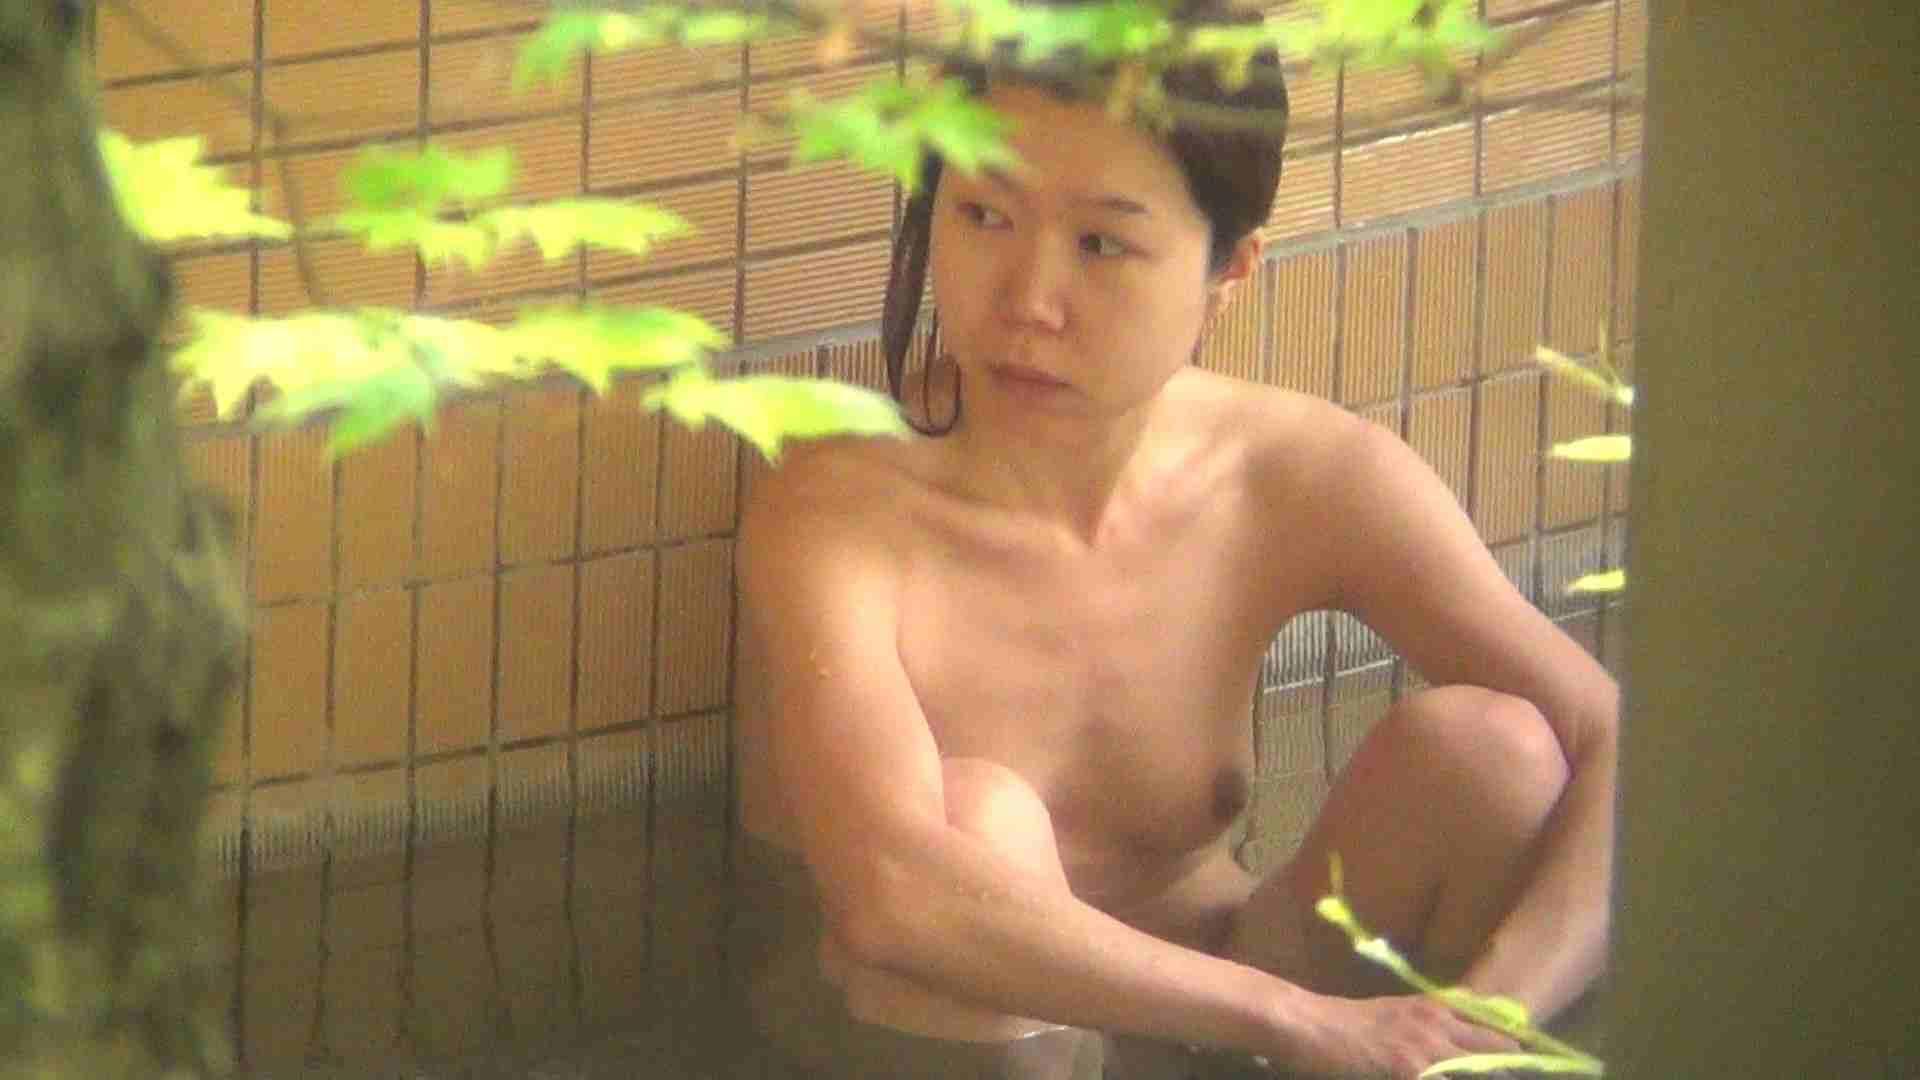 Aquaな露天風呂Vol.247 露天 オマンコ動画キャプチャ 106画像 38